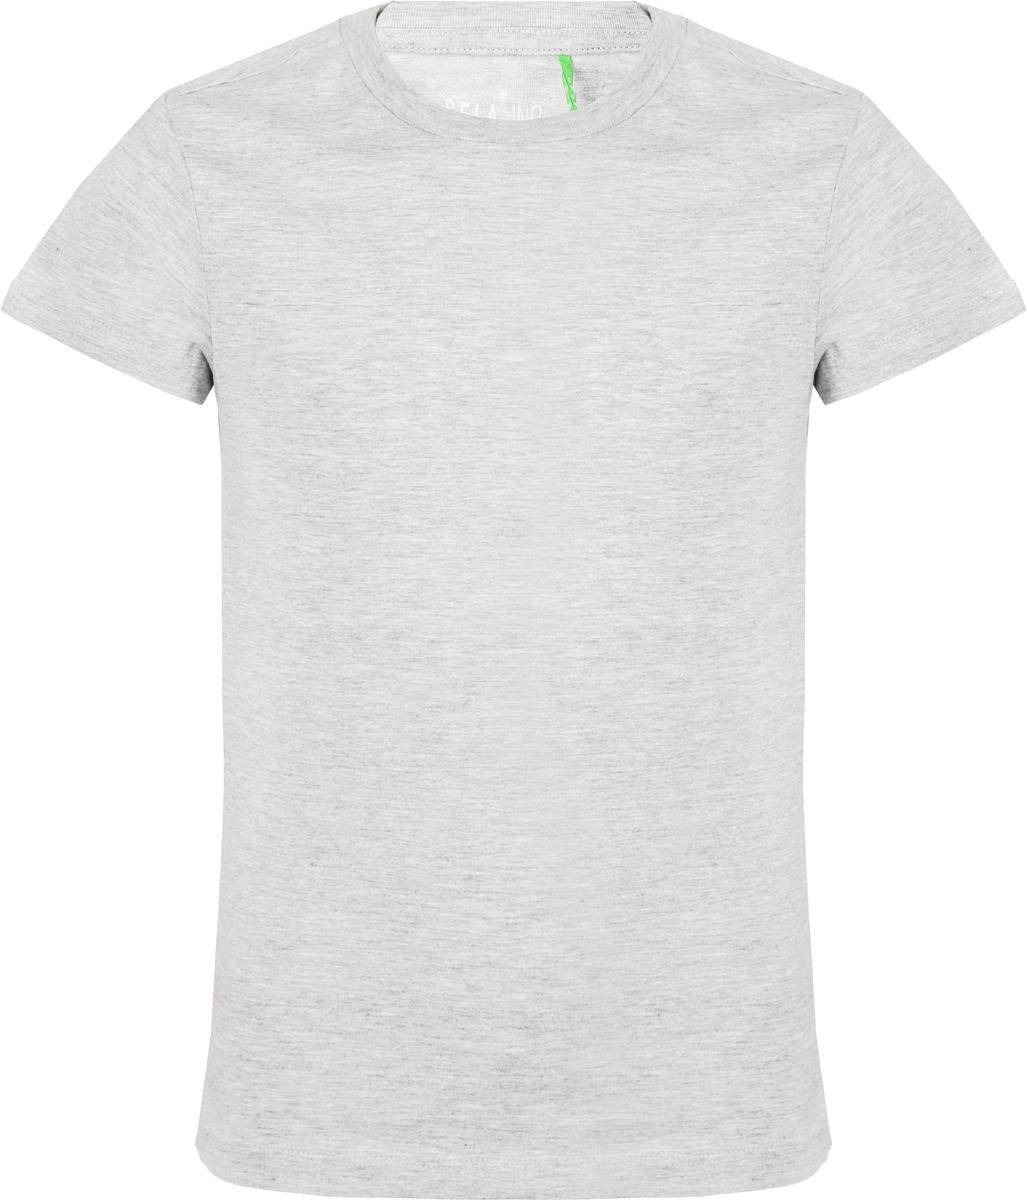 Футболка для мальчика Sela, цвет: серый меланж. Ts-811/1101-8320. Размер 152 sela ts 411 094 7161